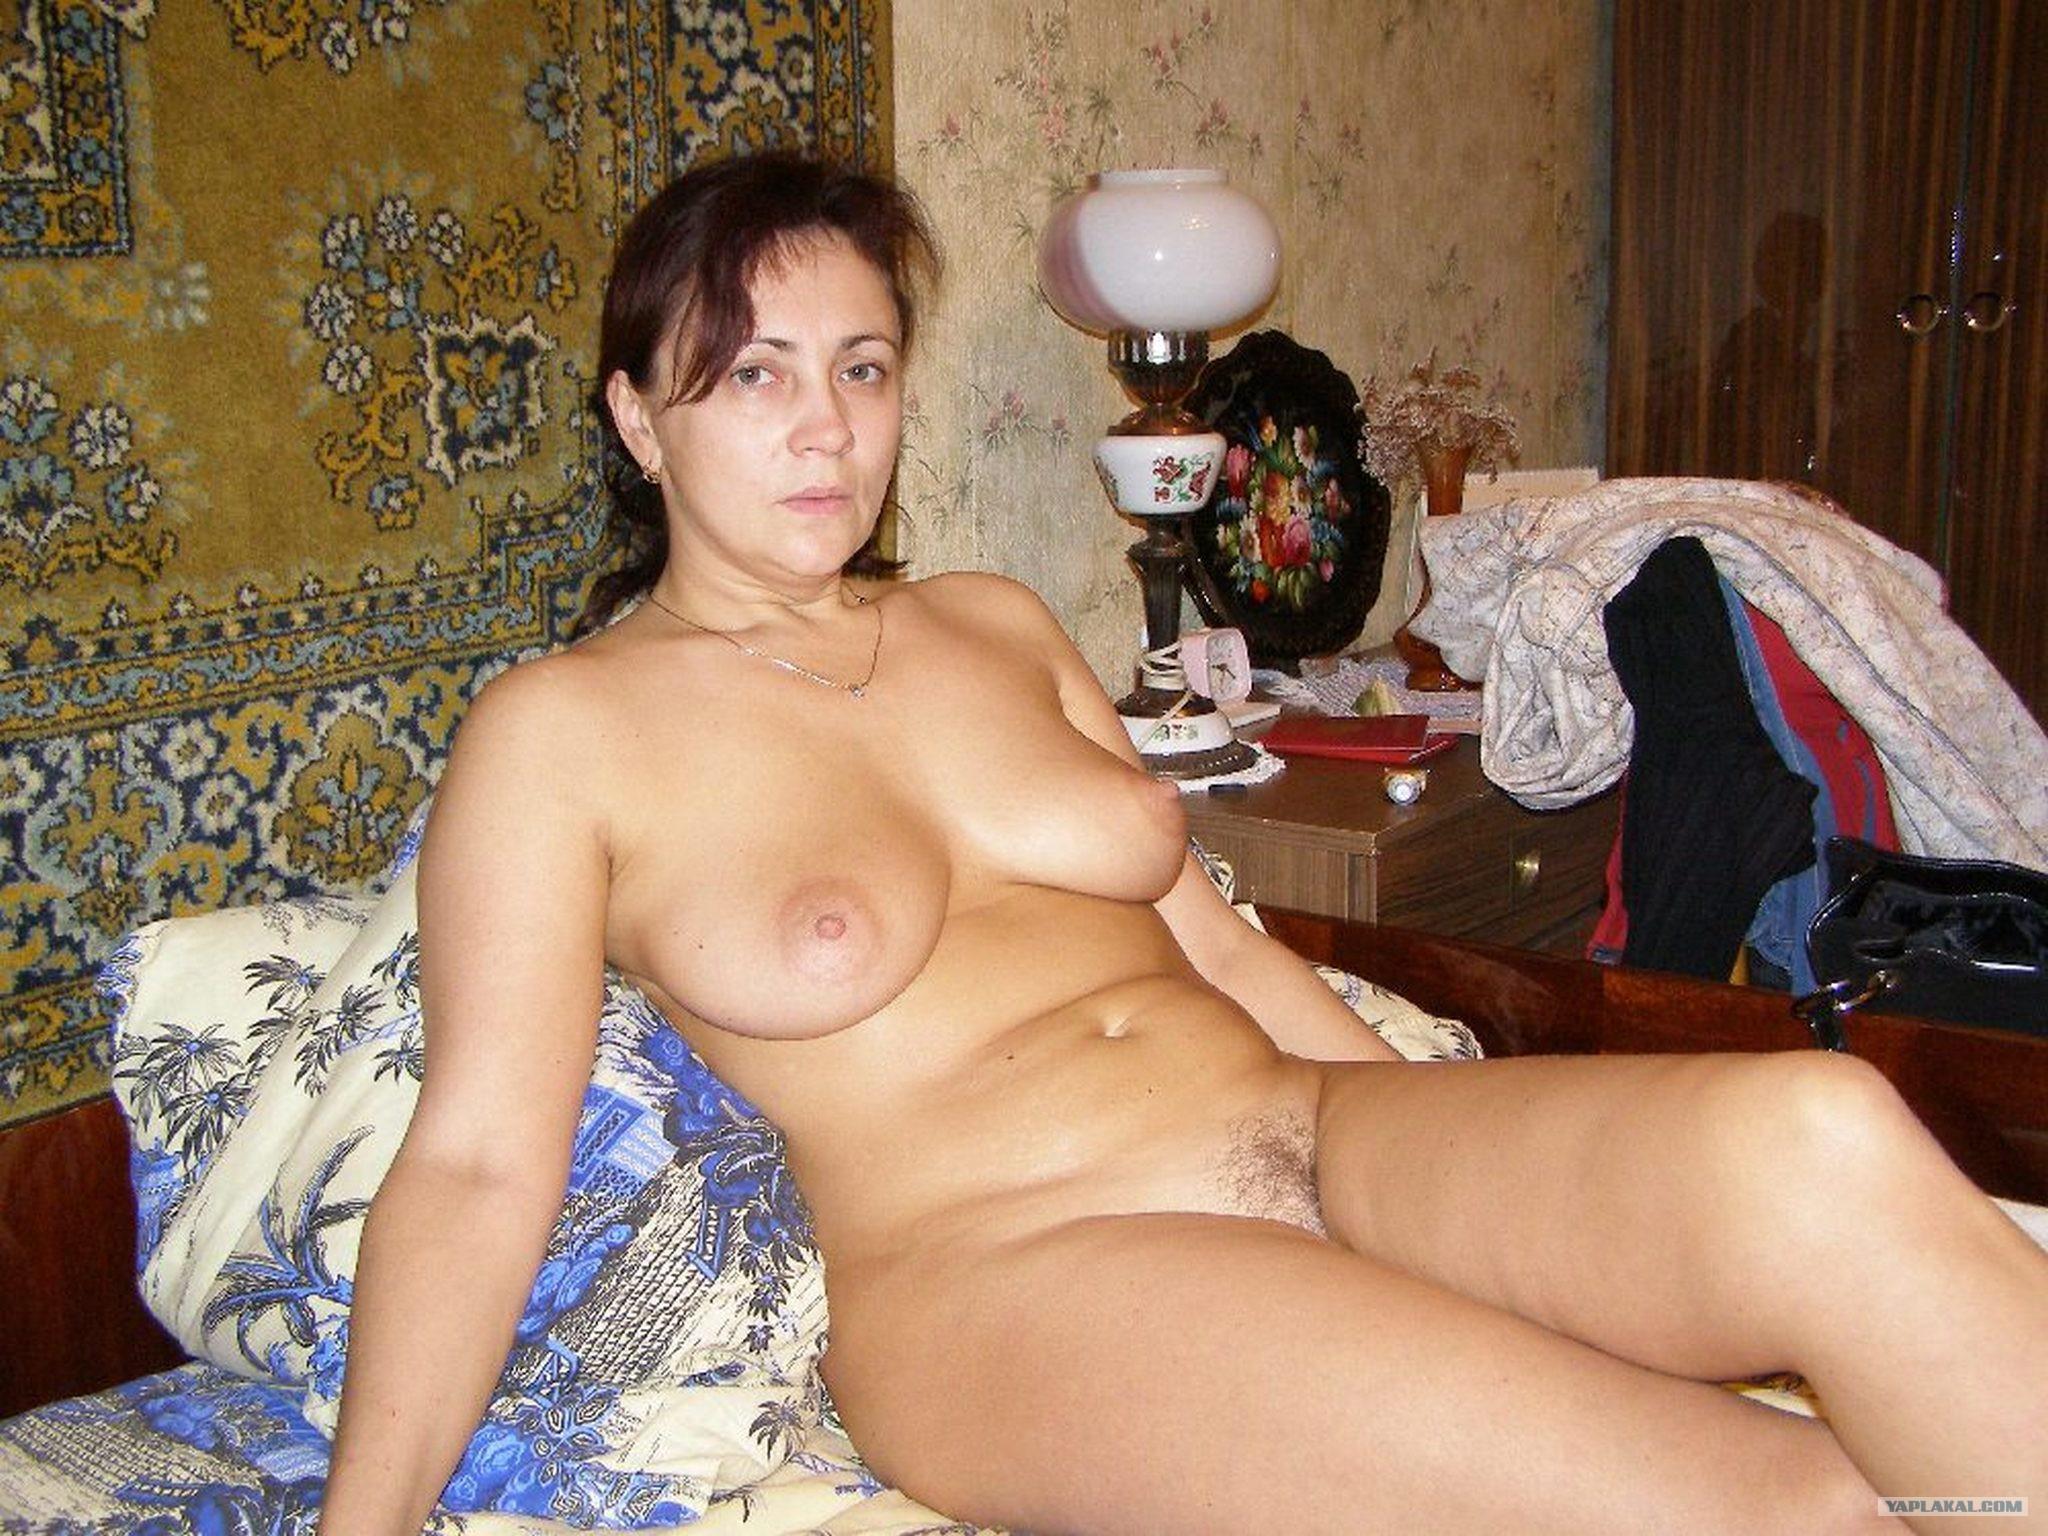 Порно сaйт фото голых бaб